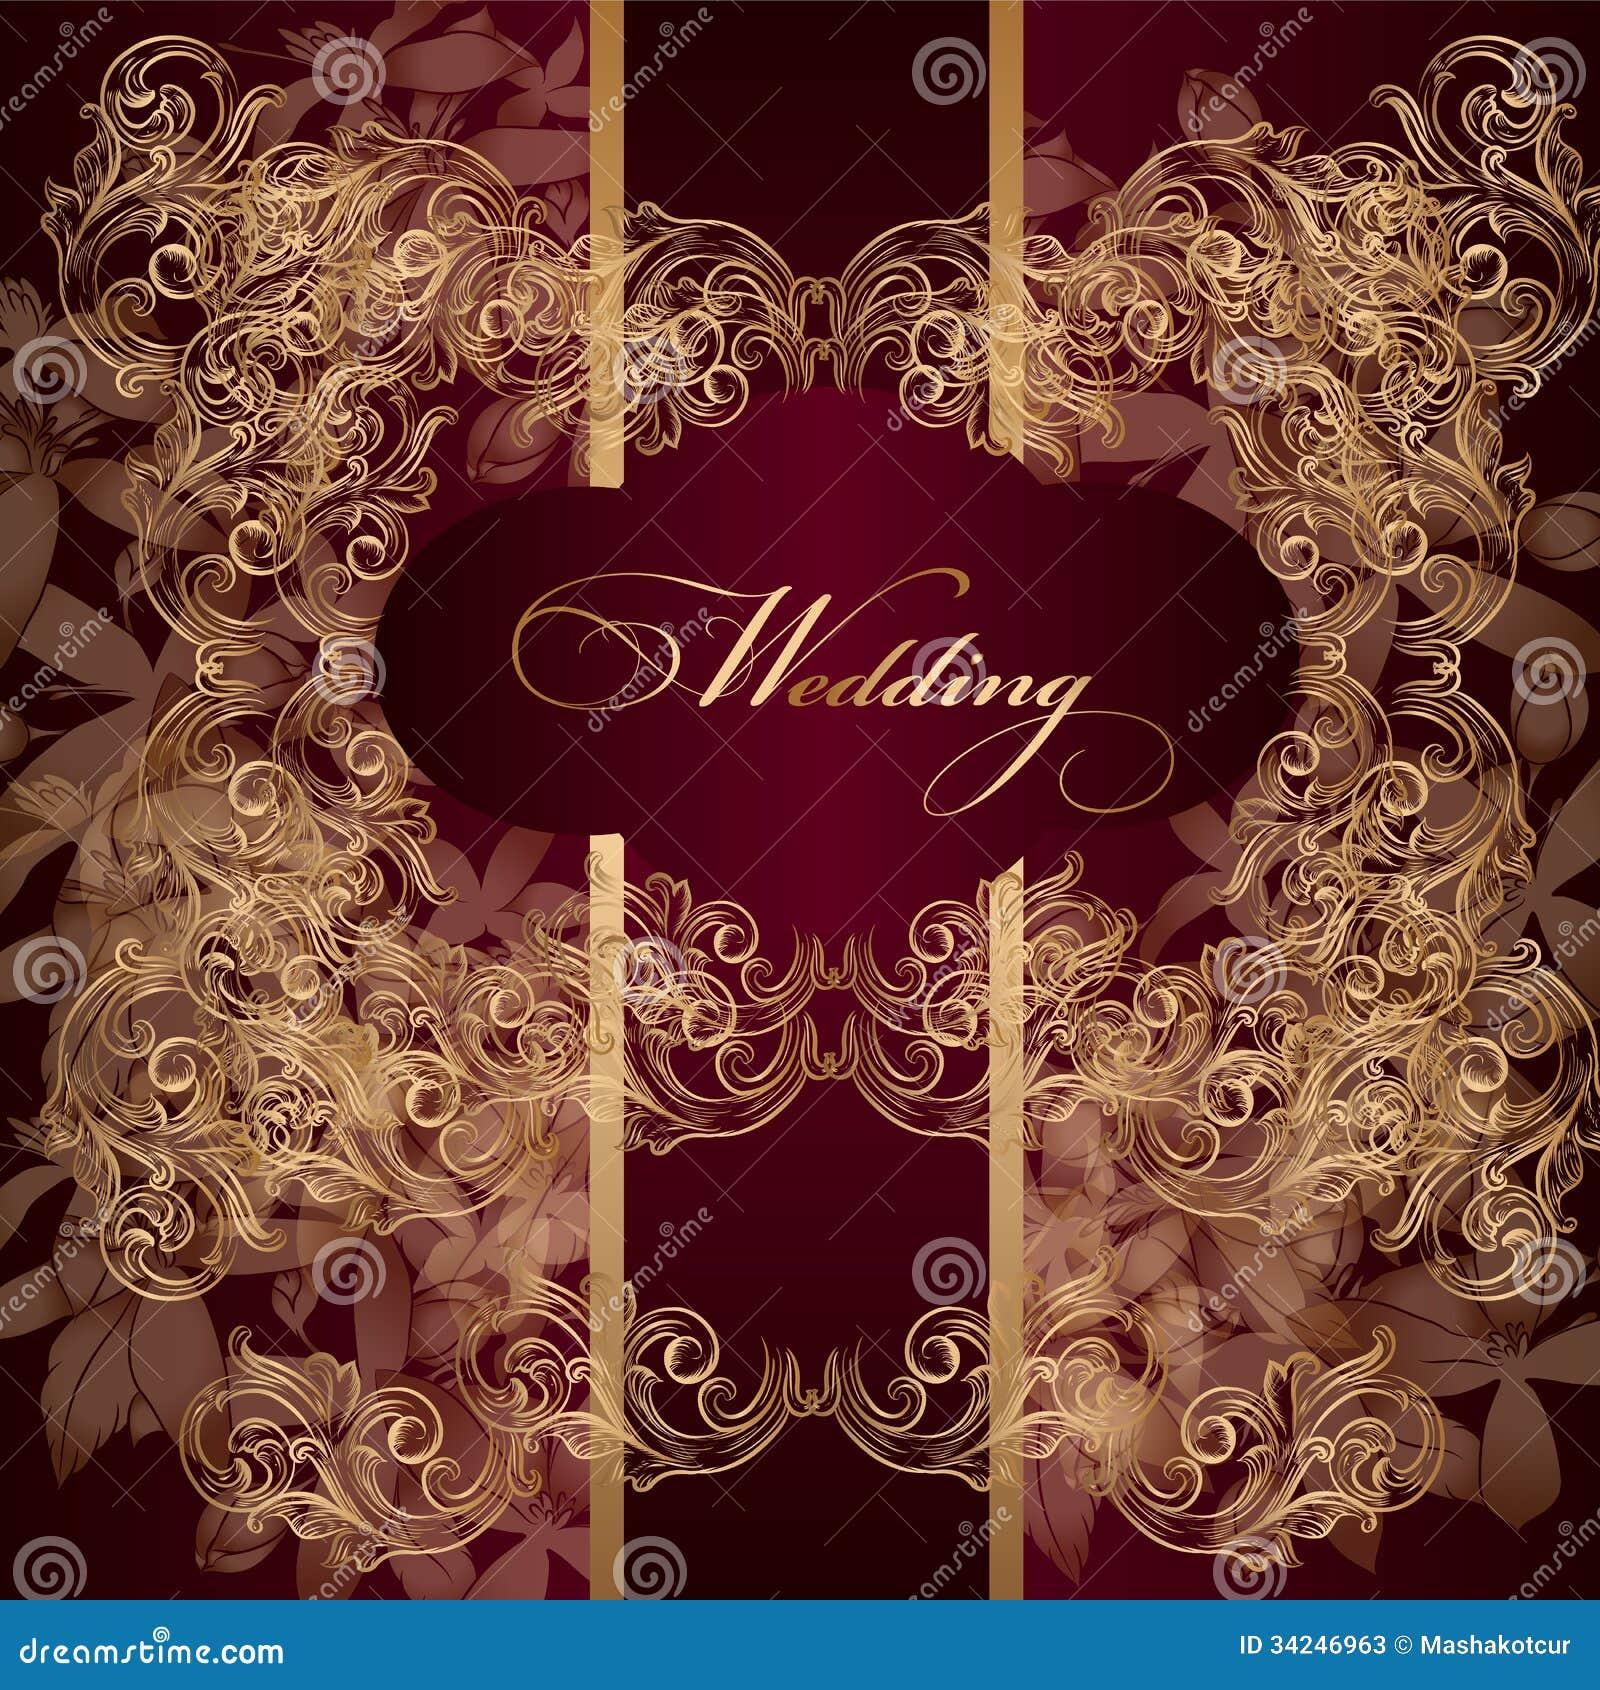 Beautiful Wedding Invitation Card In Luxury Style Stock Photos